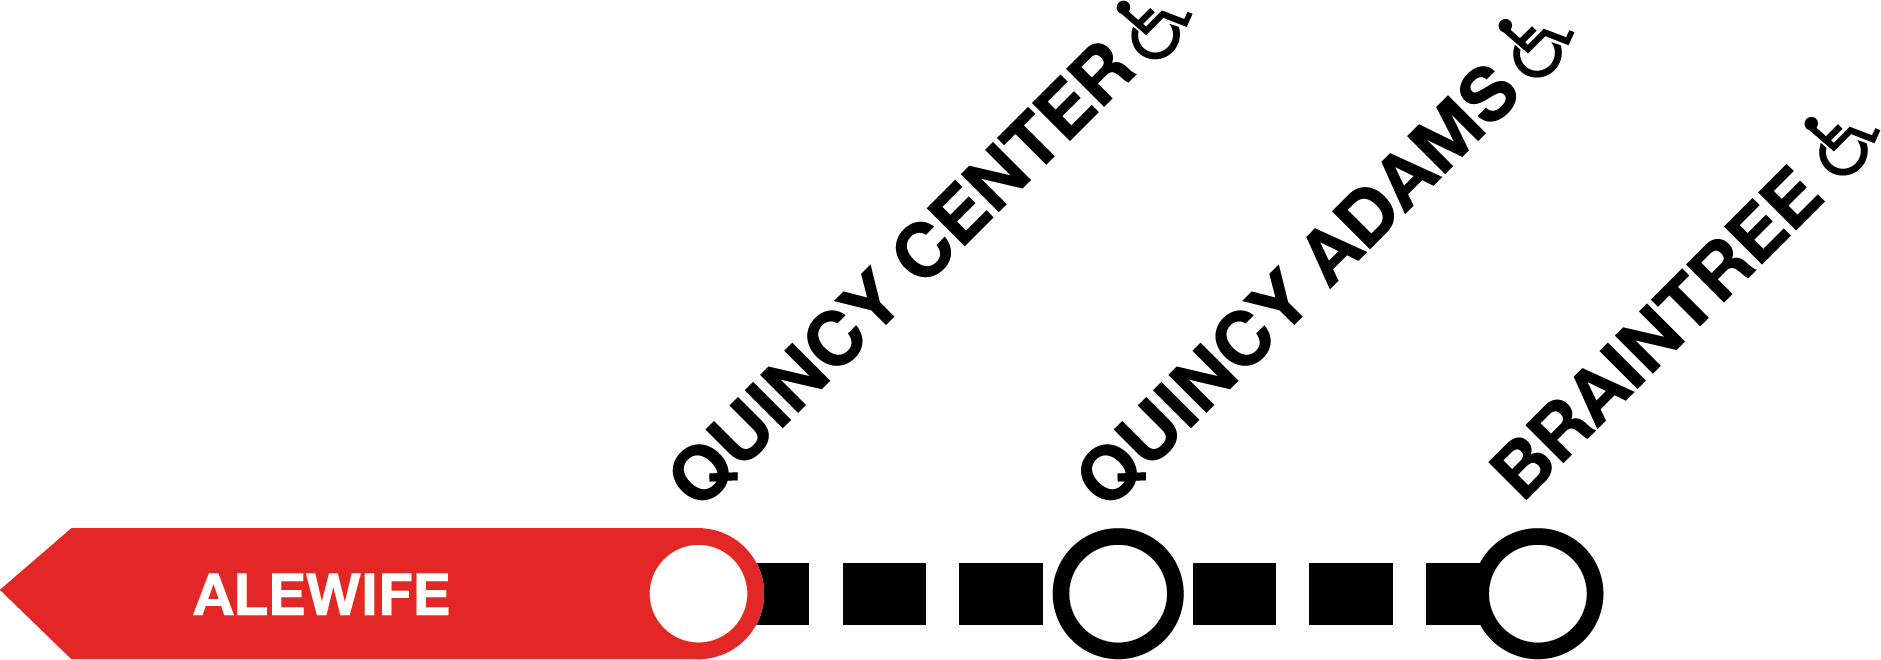 quincy-center-braintree-shuttle